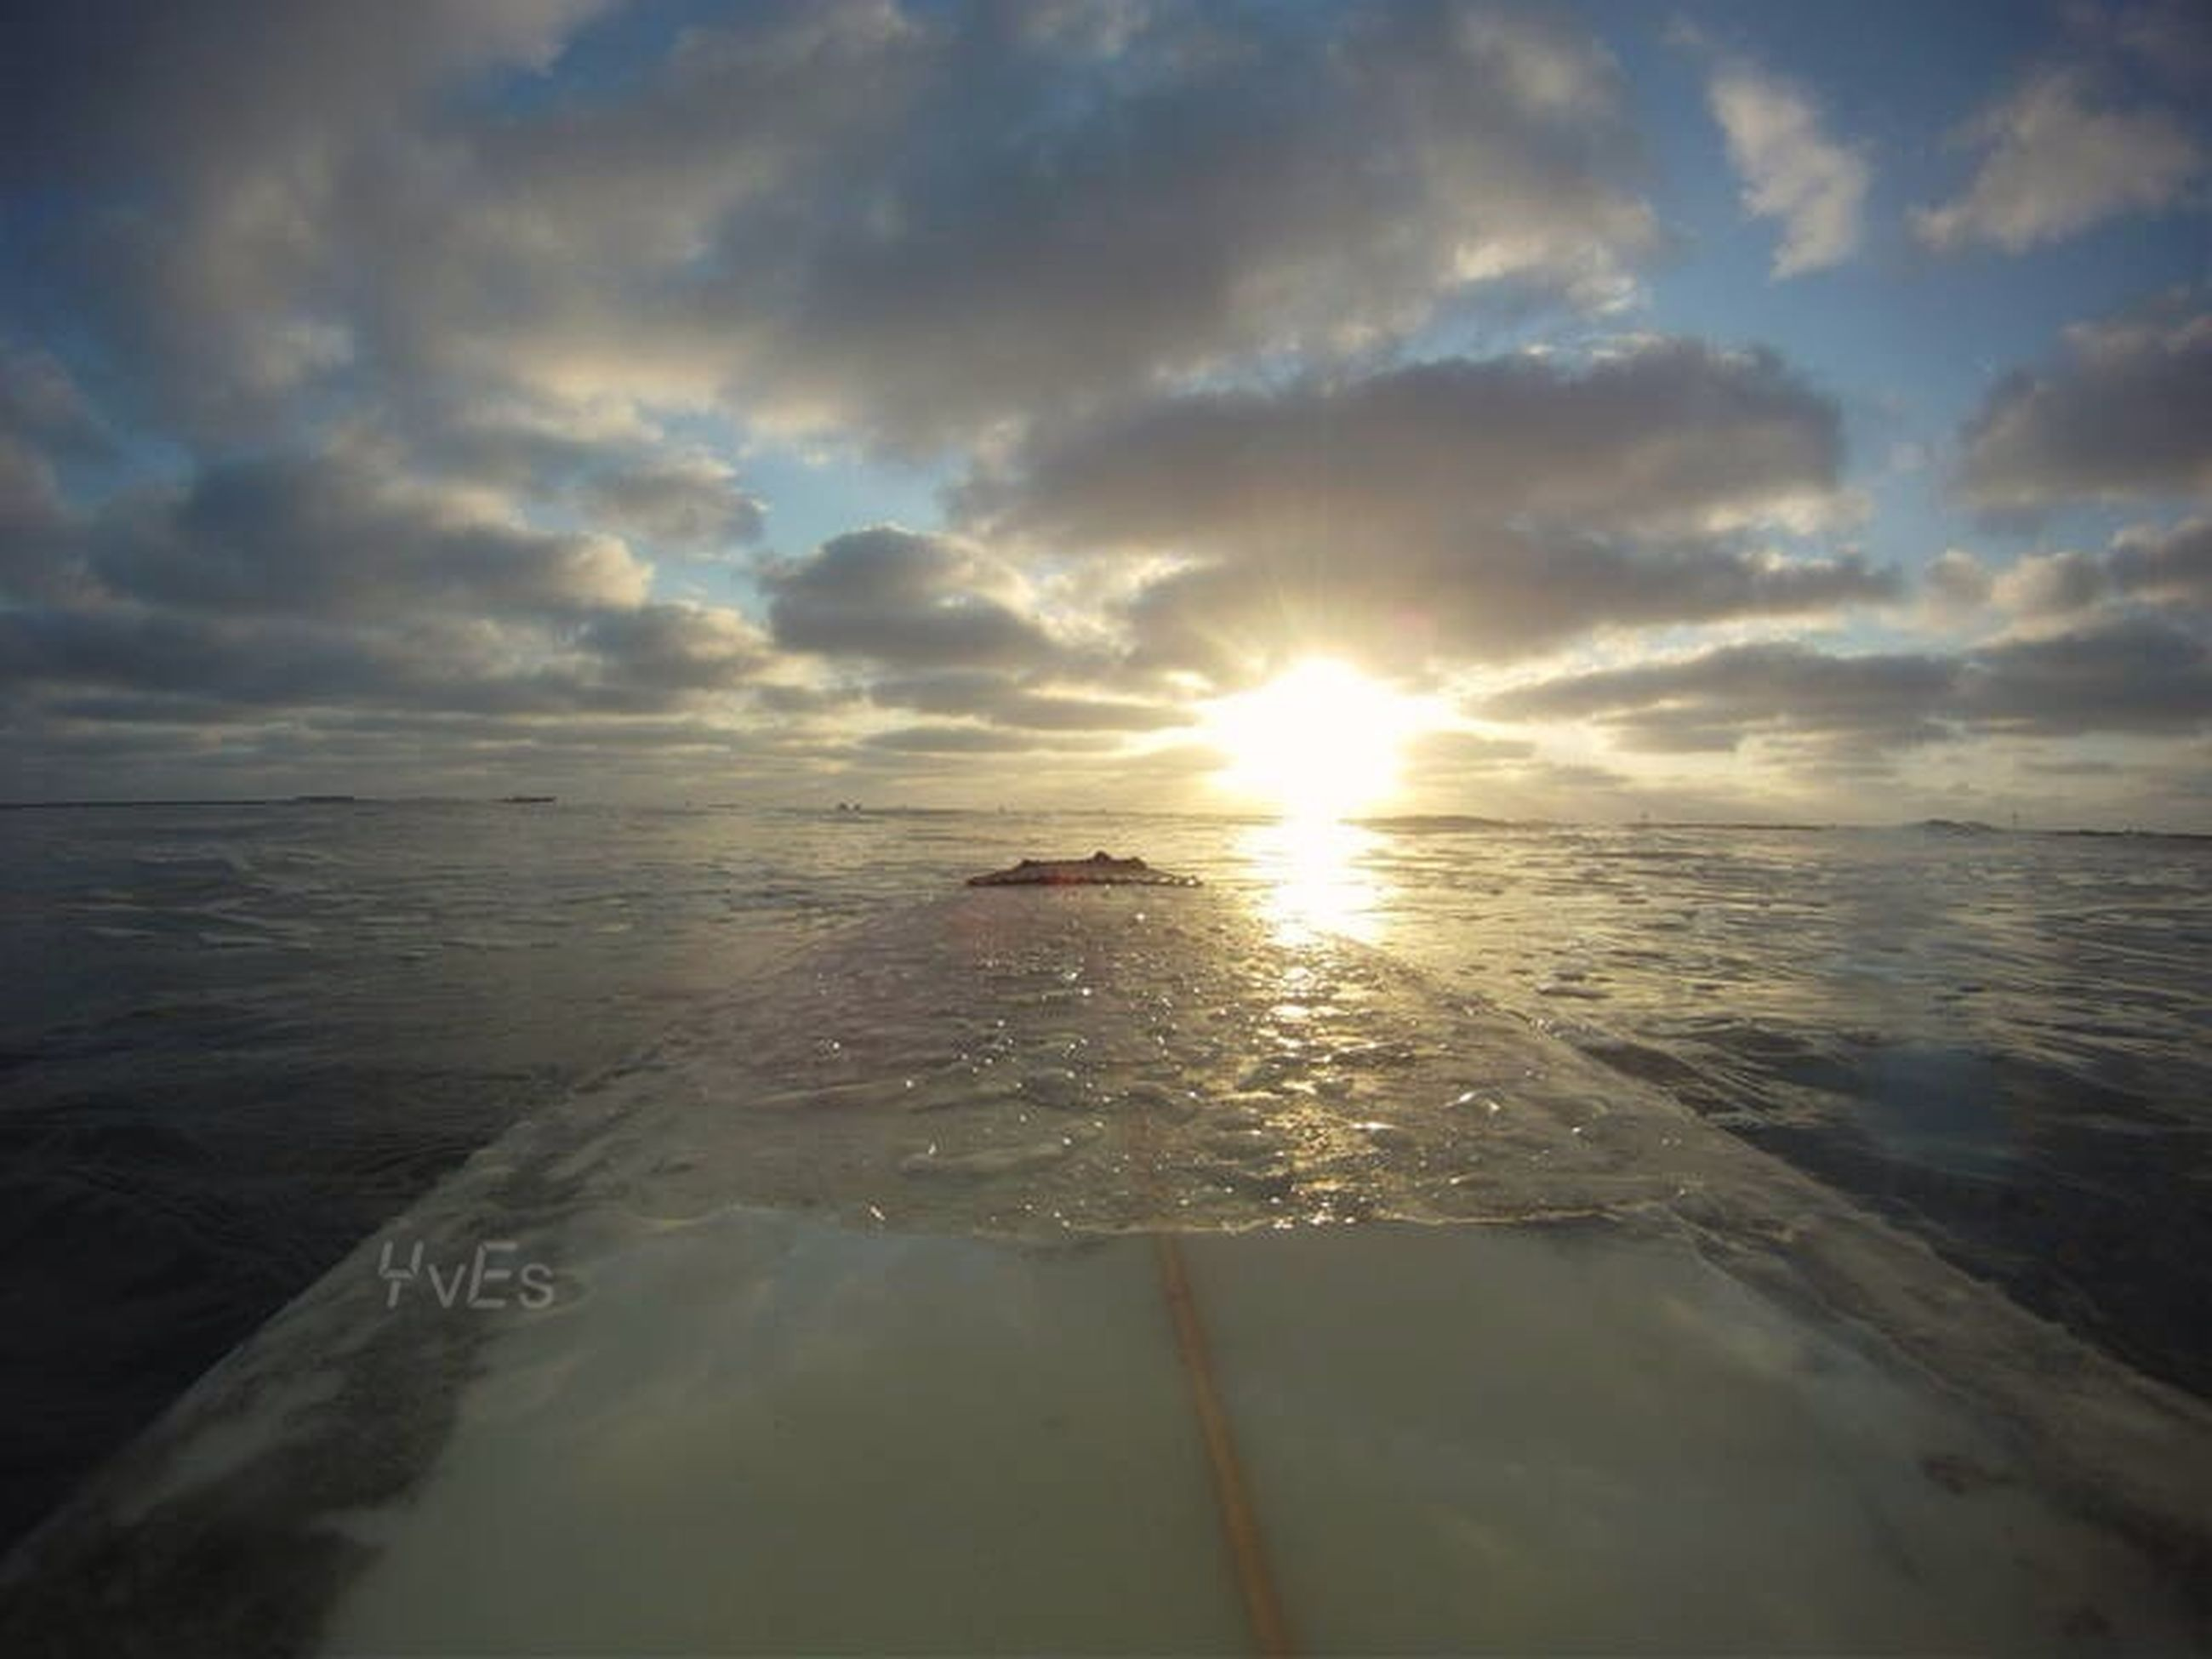 sea, water, sun, horizon over water, sunset, scenics, sky, tranquil scene, beauty in nature, tranquility, reflection, beach, sunbeam, cloud - sky, sunlight, nature, shore, idyllic, wave, lens flare